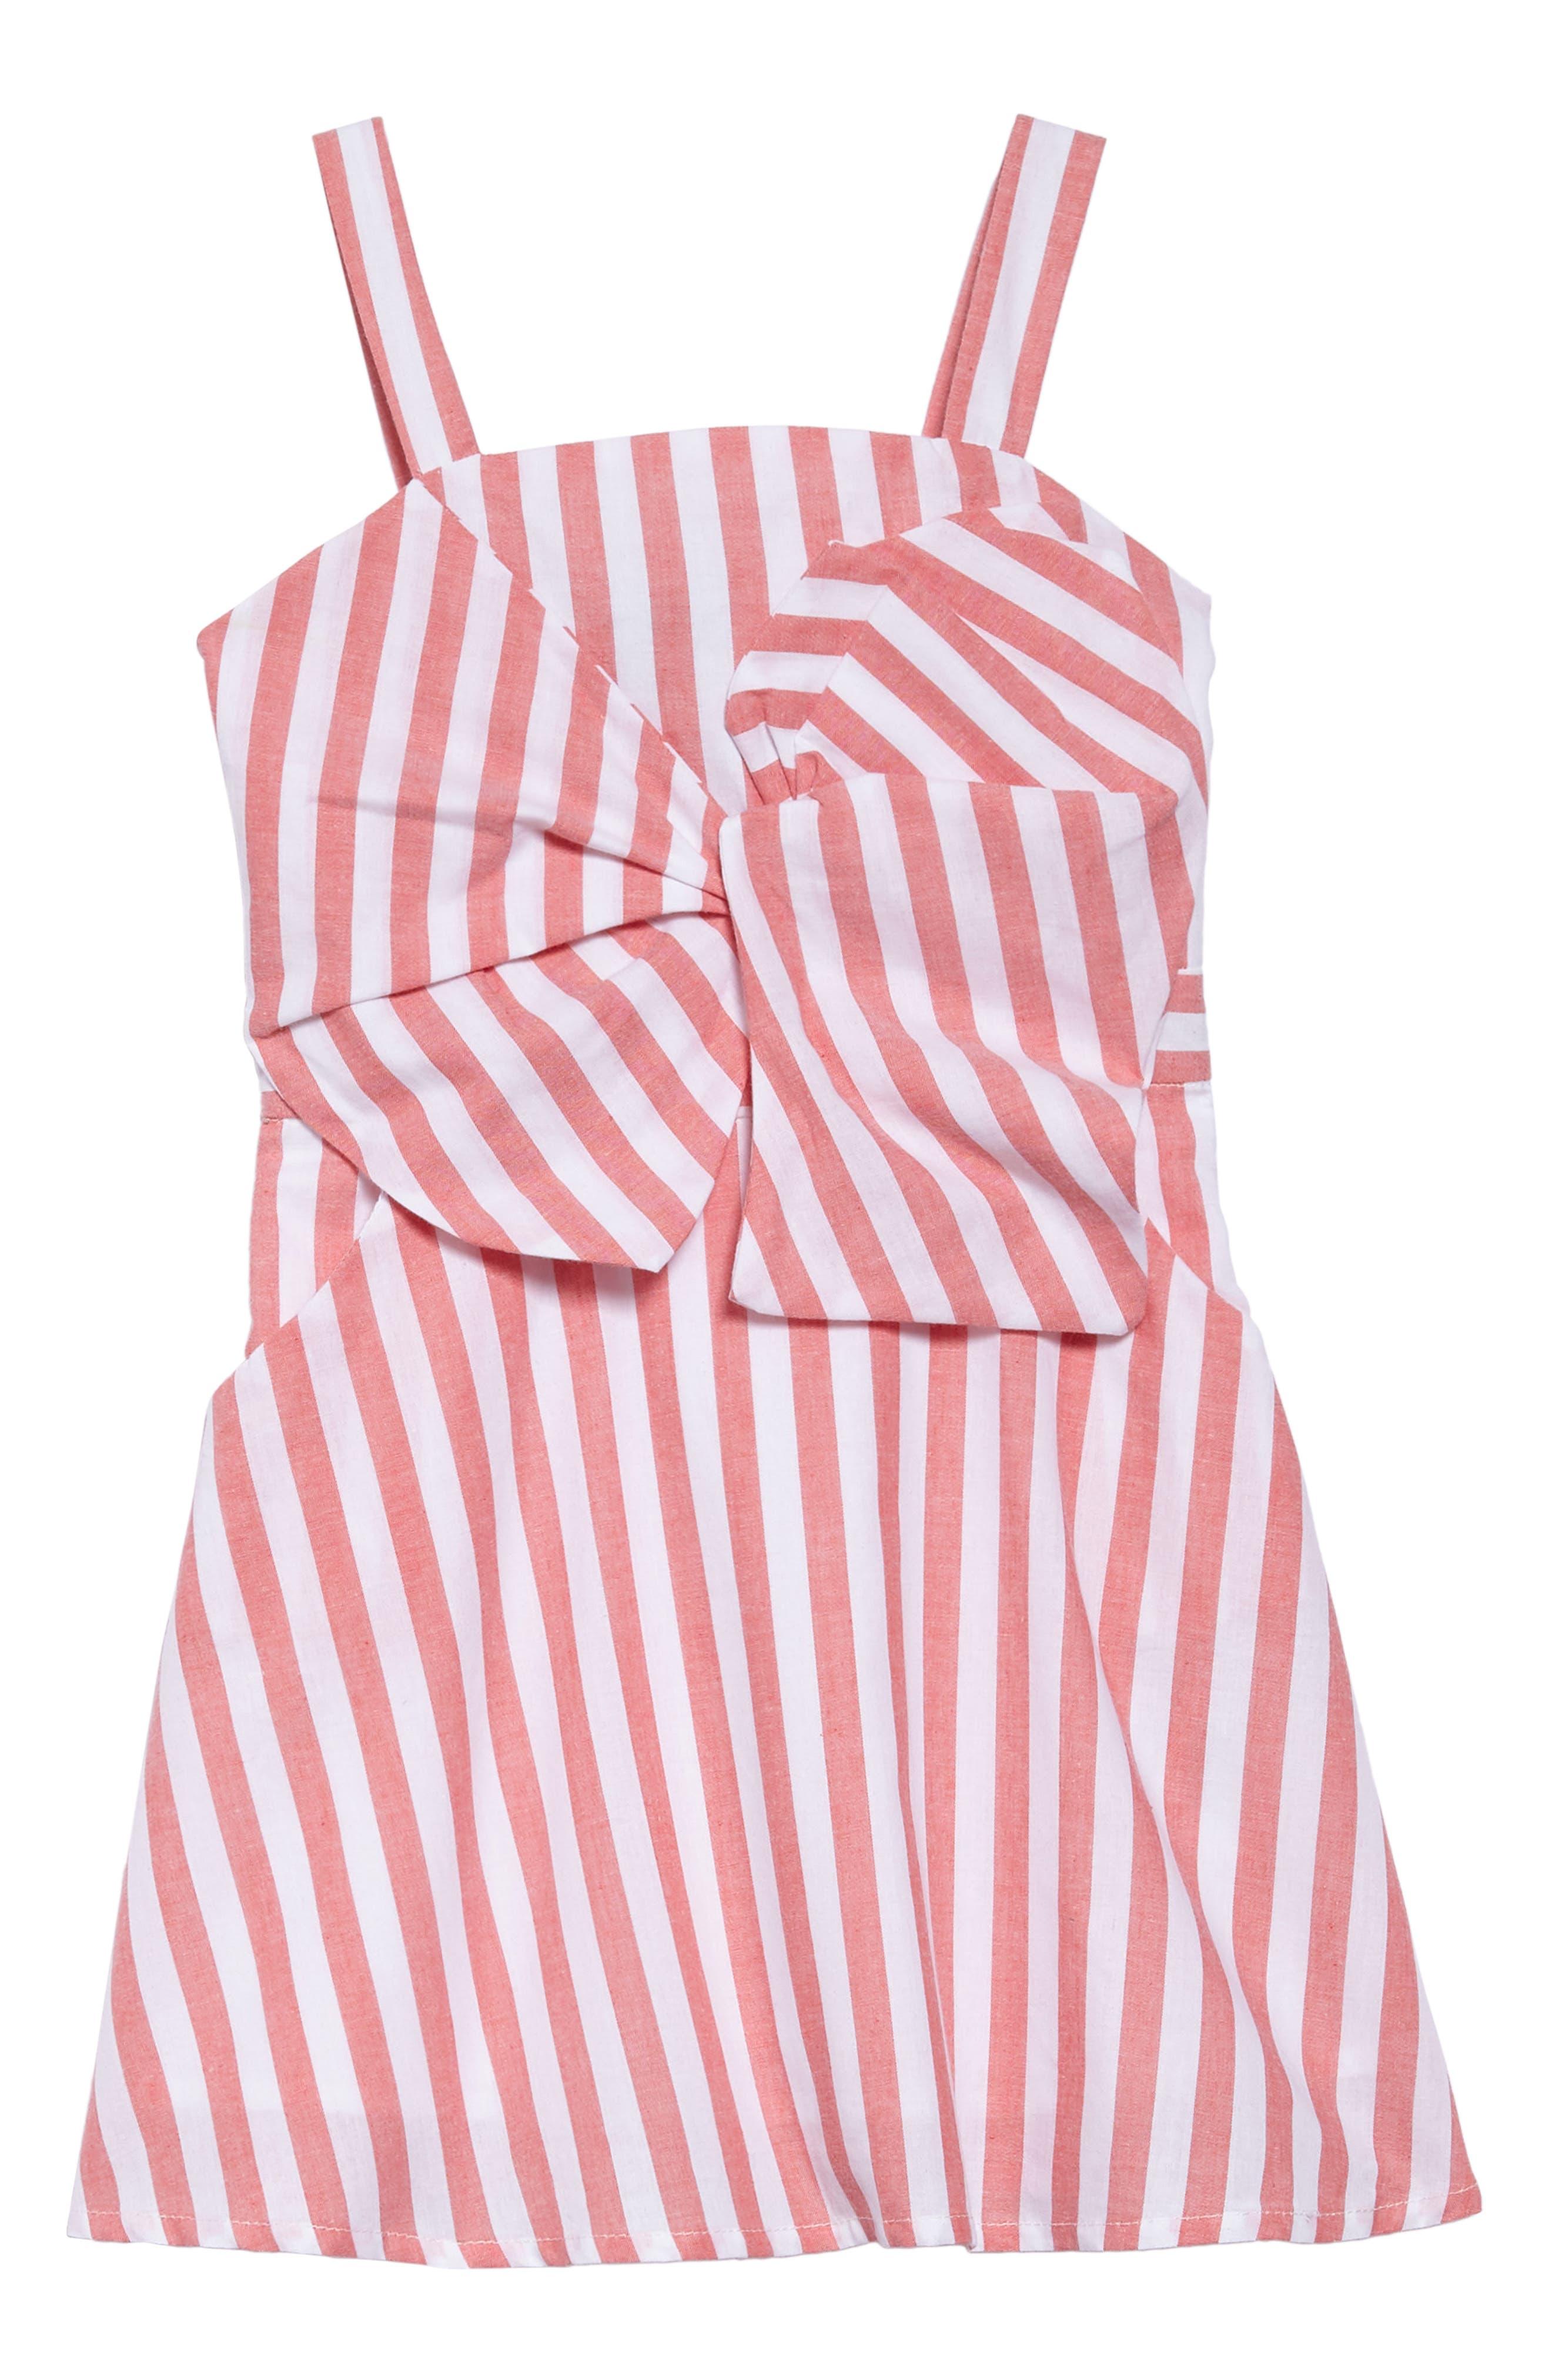 Mable Stripe Dress,                             Main thumbnail 1, color,                             600